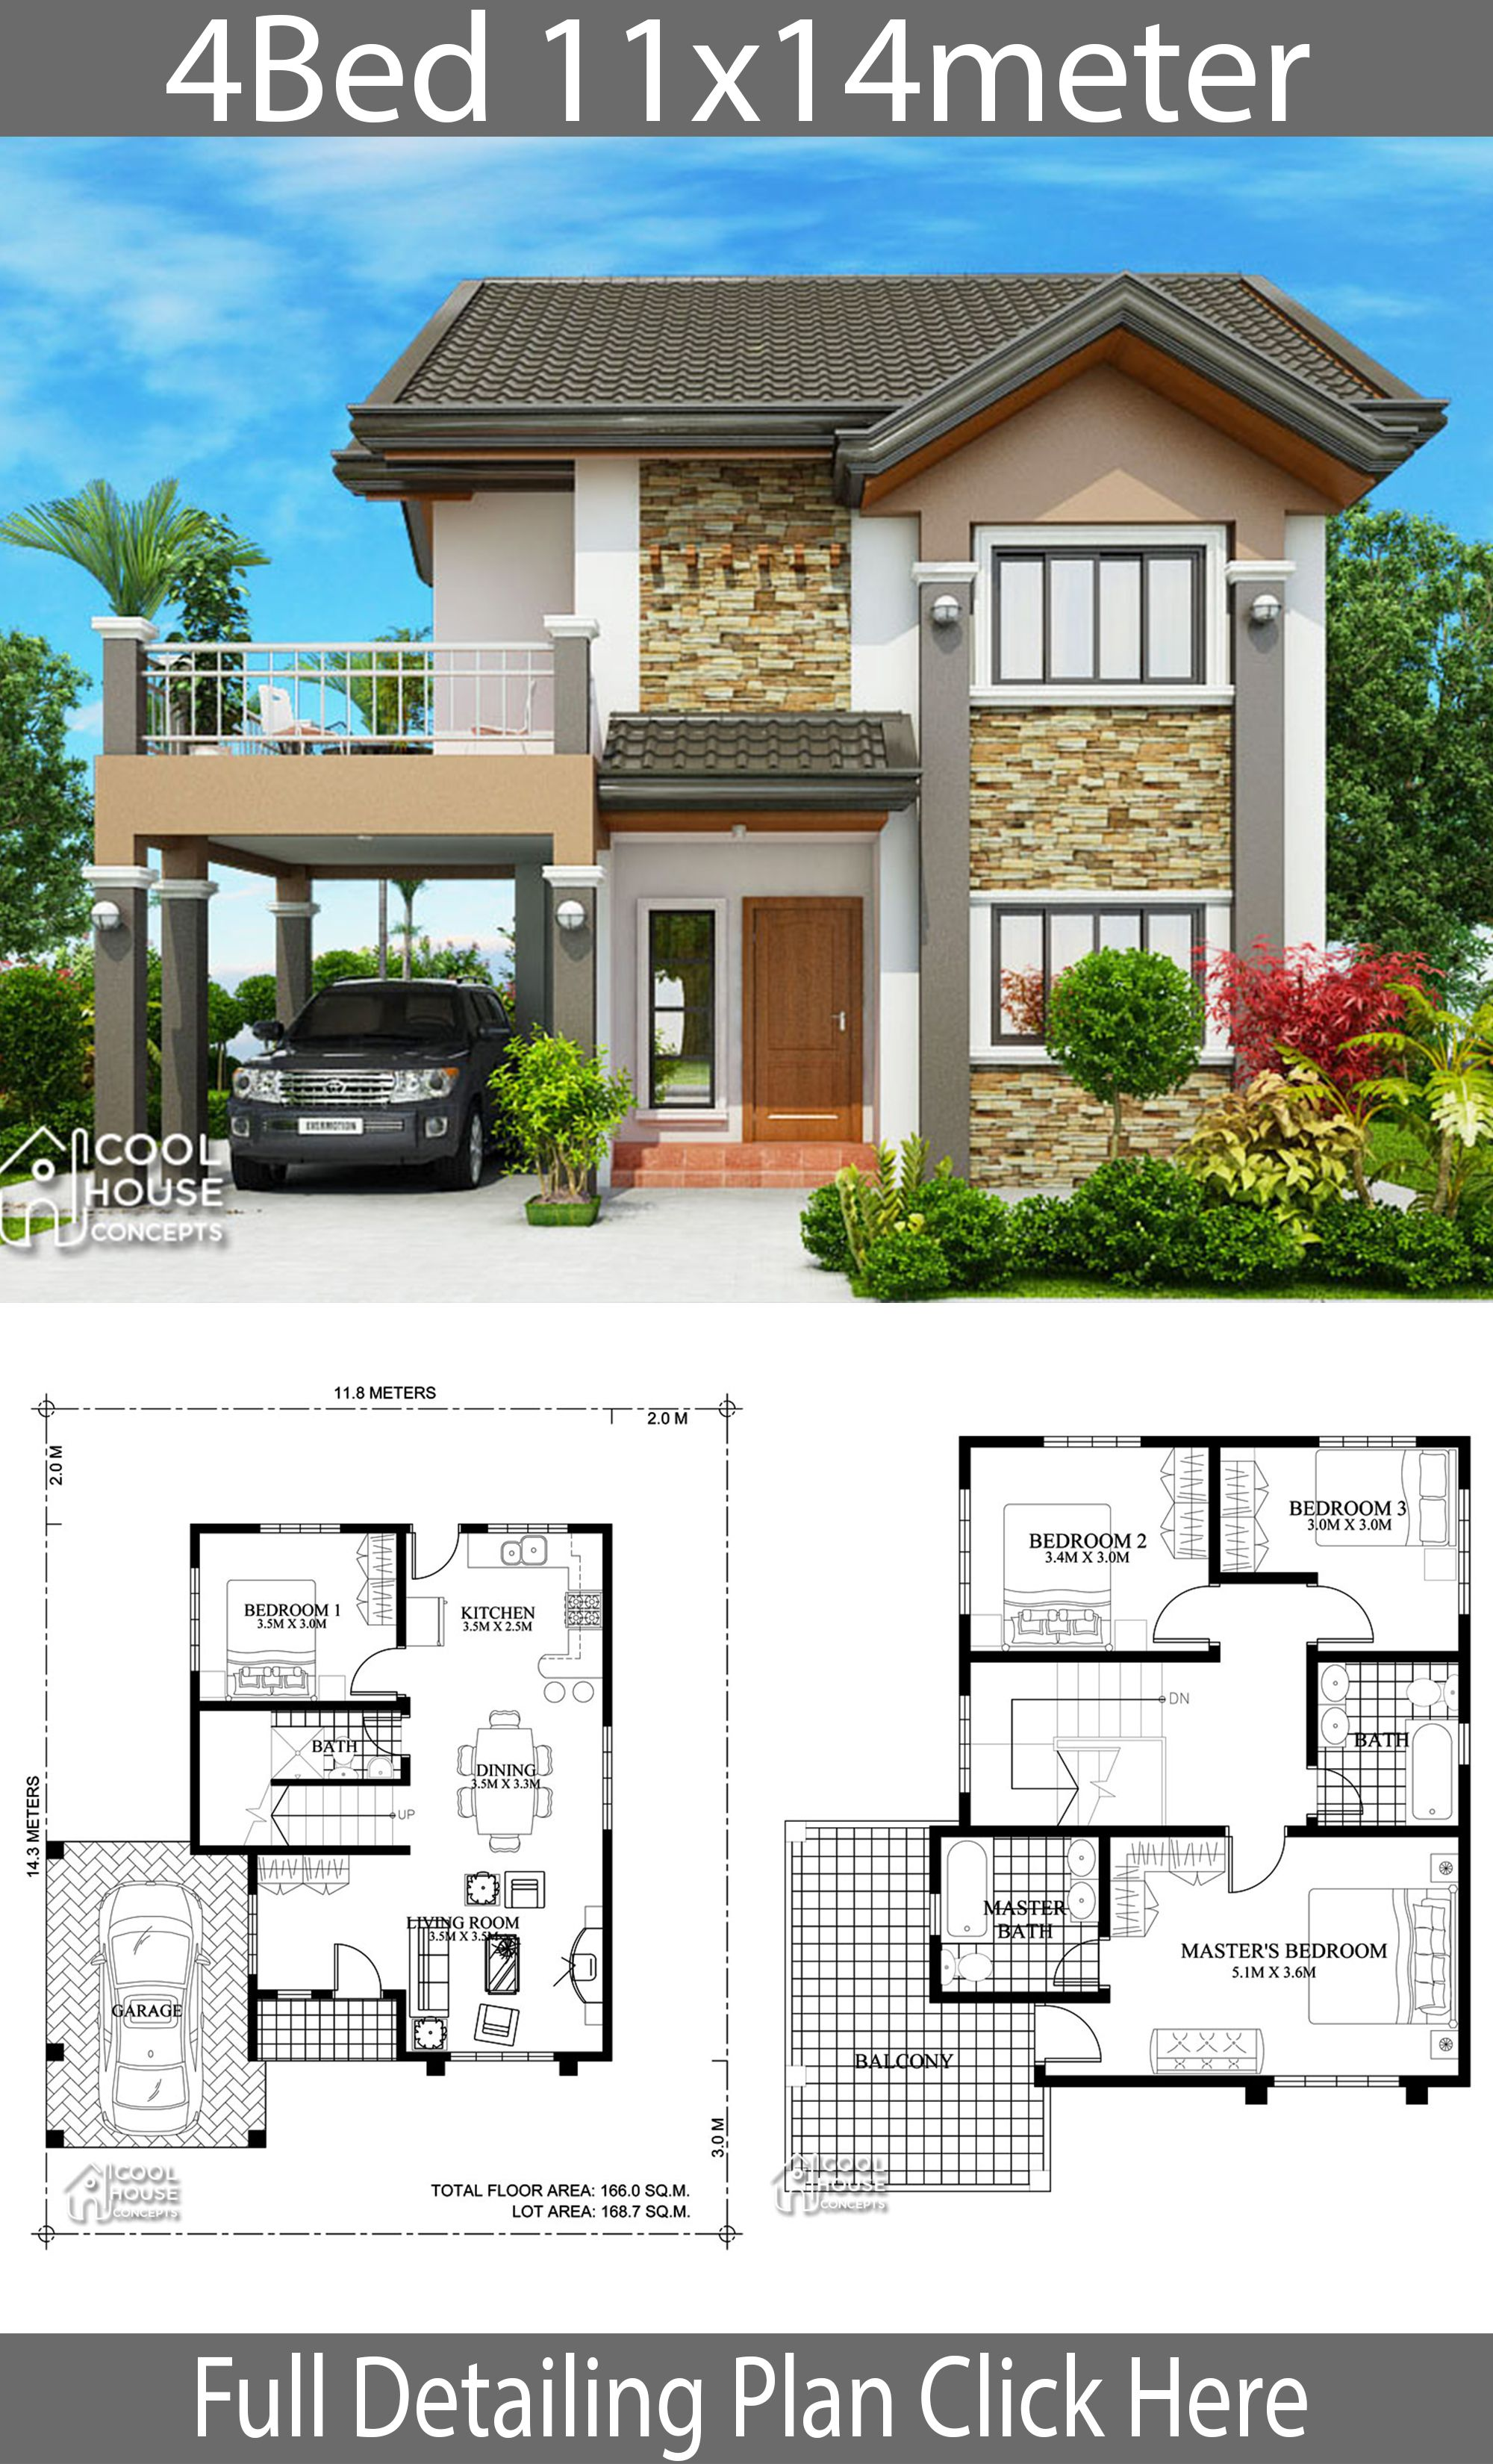 Pin By Sisy On Samphoas House Plan Philippines House Design Duplex House Design Two Story House Design